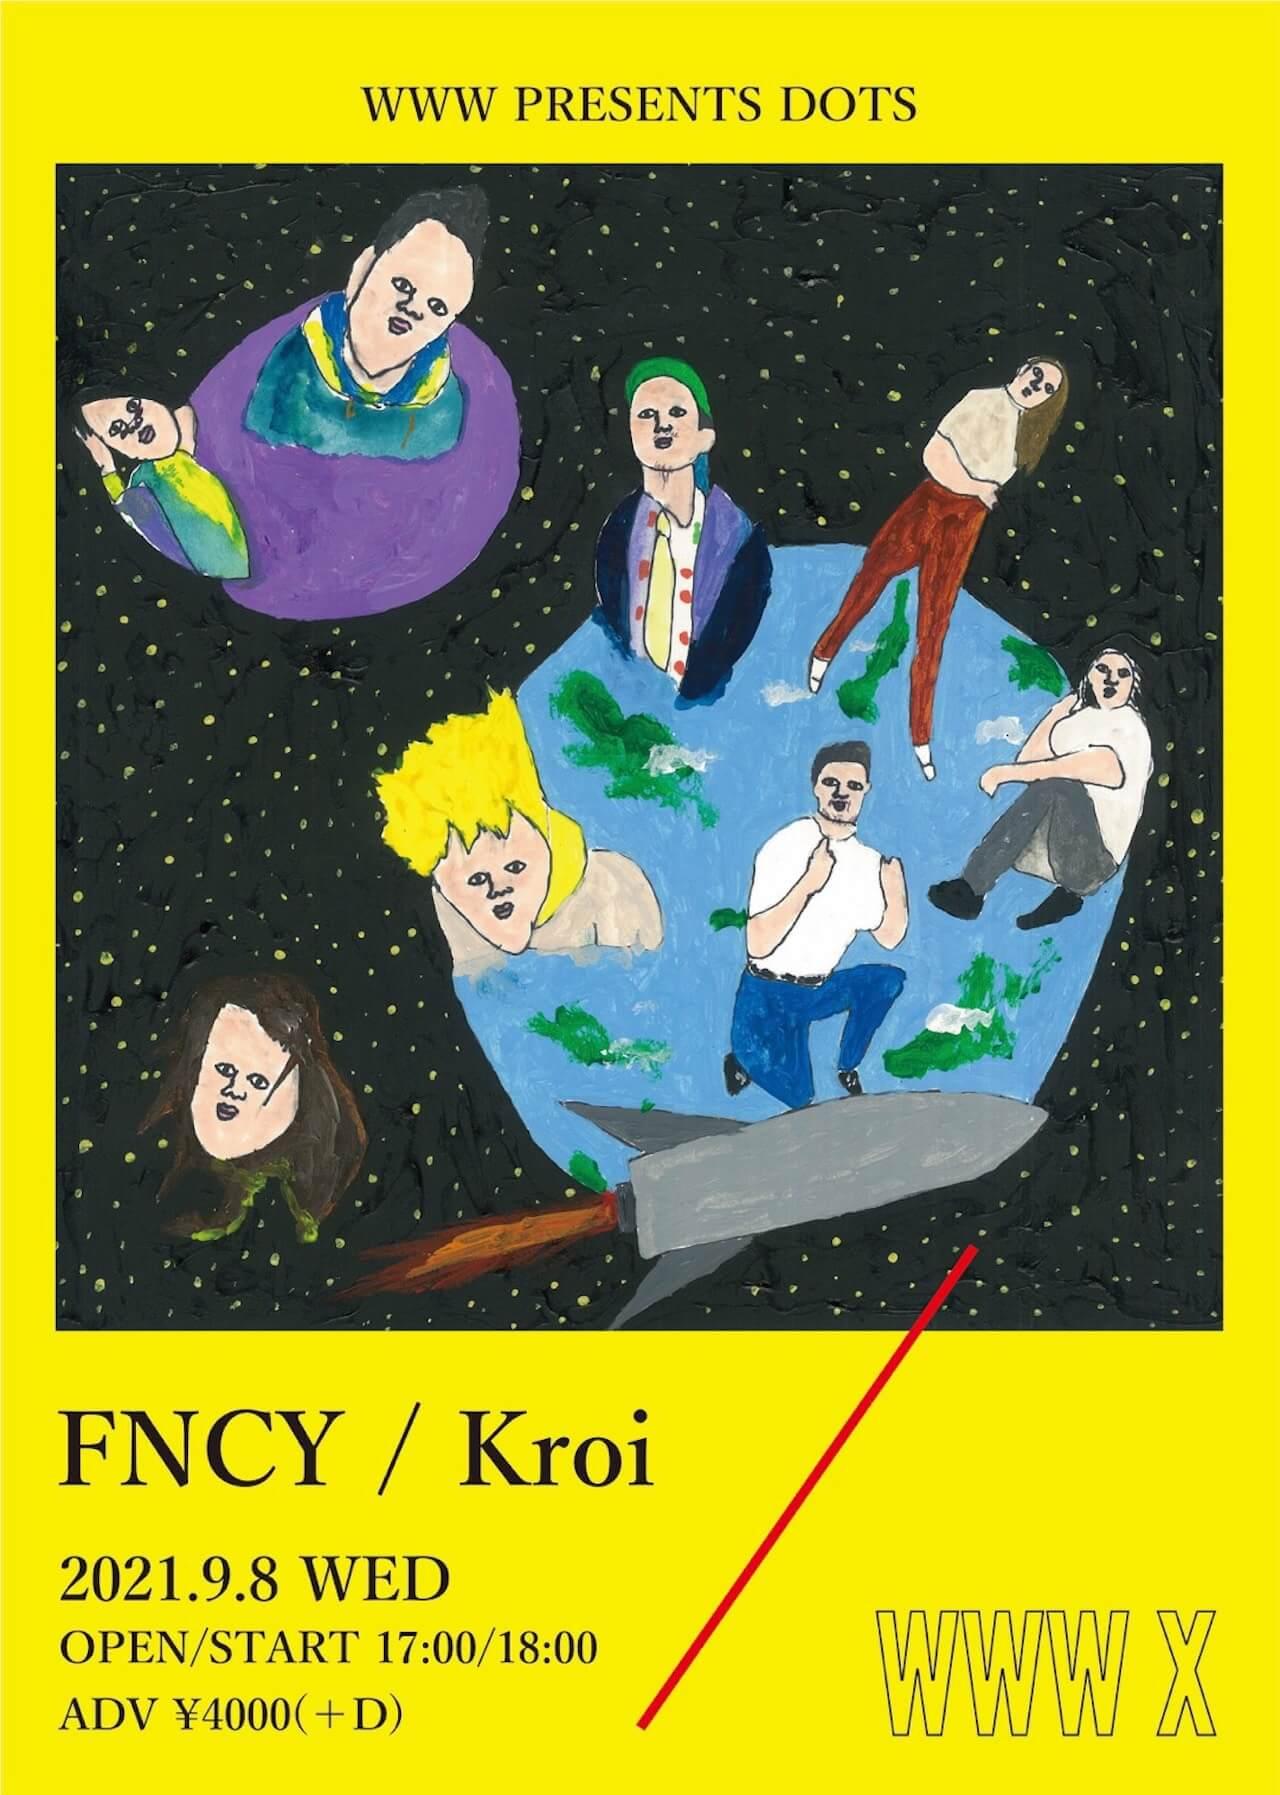 FNCY、kroiが初共演!WWWのツーマン企画<dots>が9月開催 music210729-dots-fncy-kroi-1